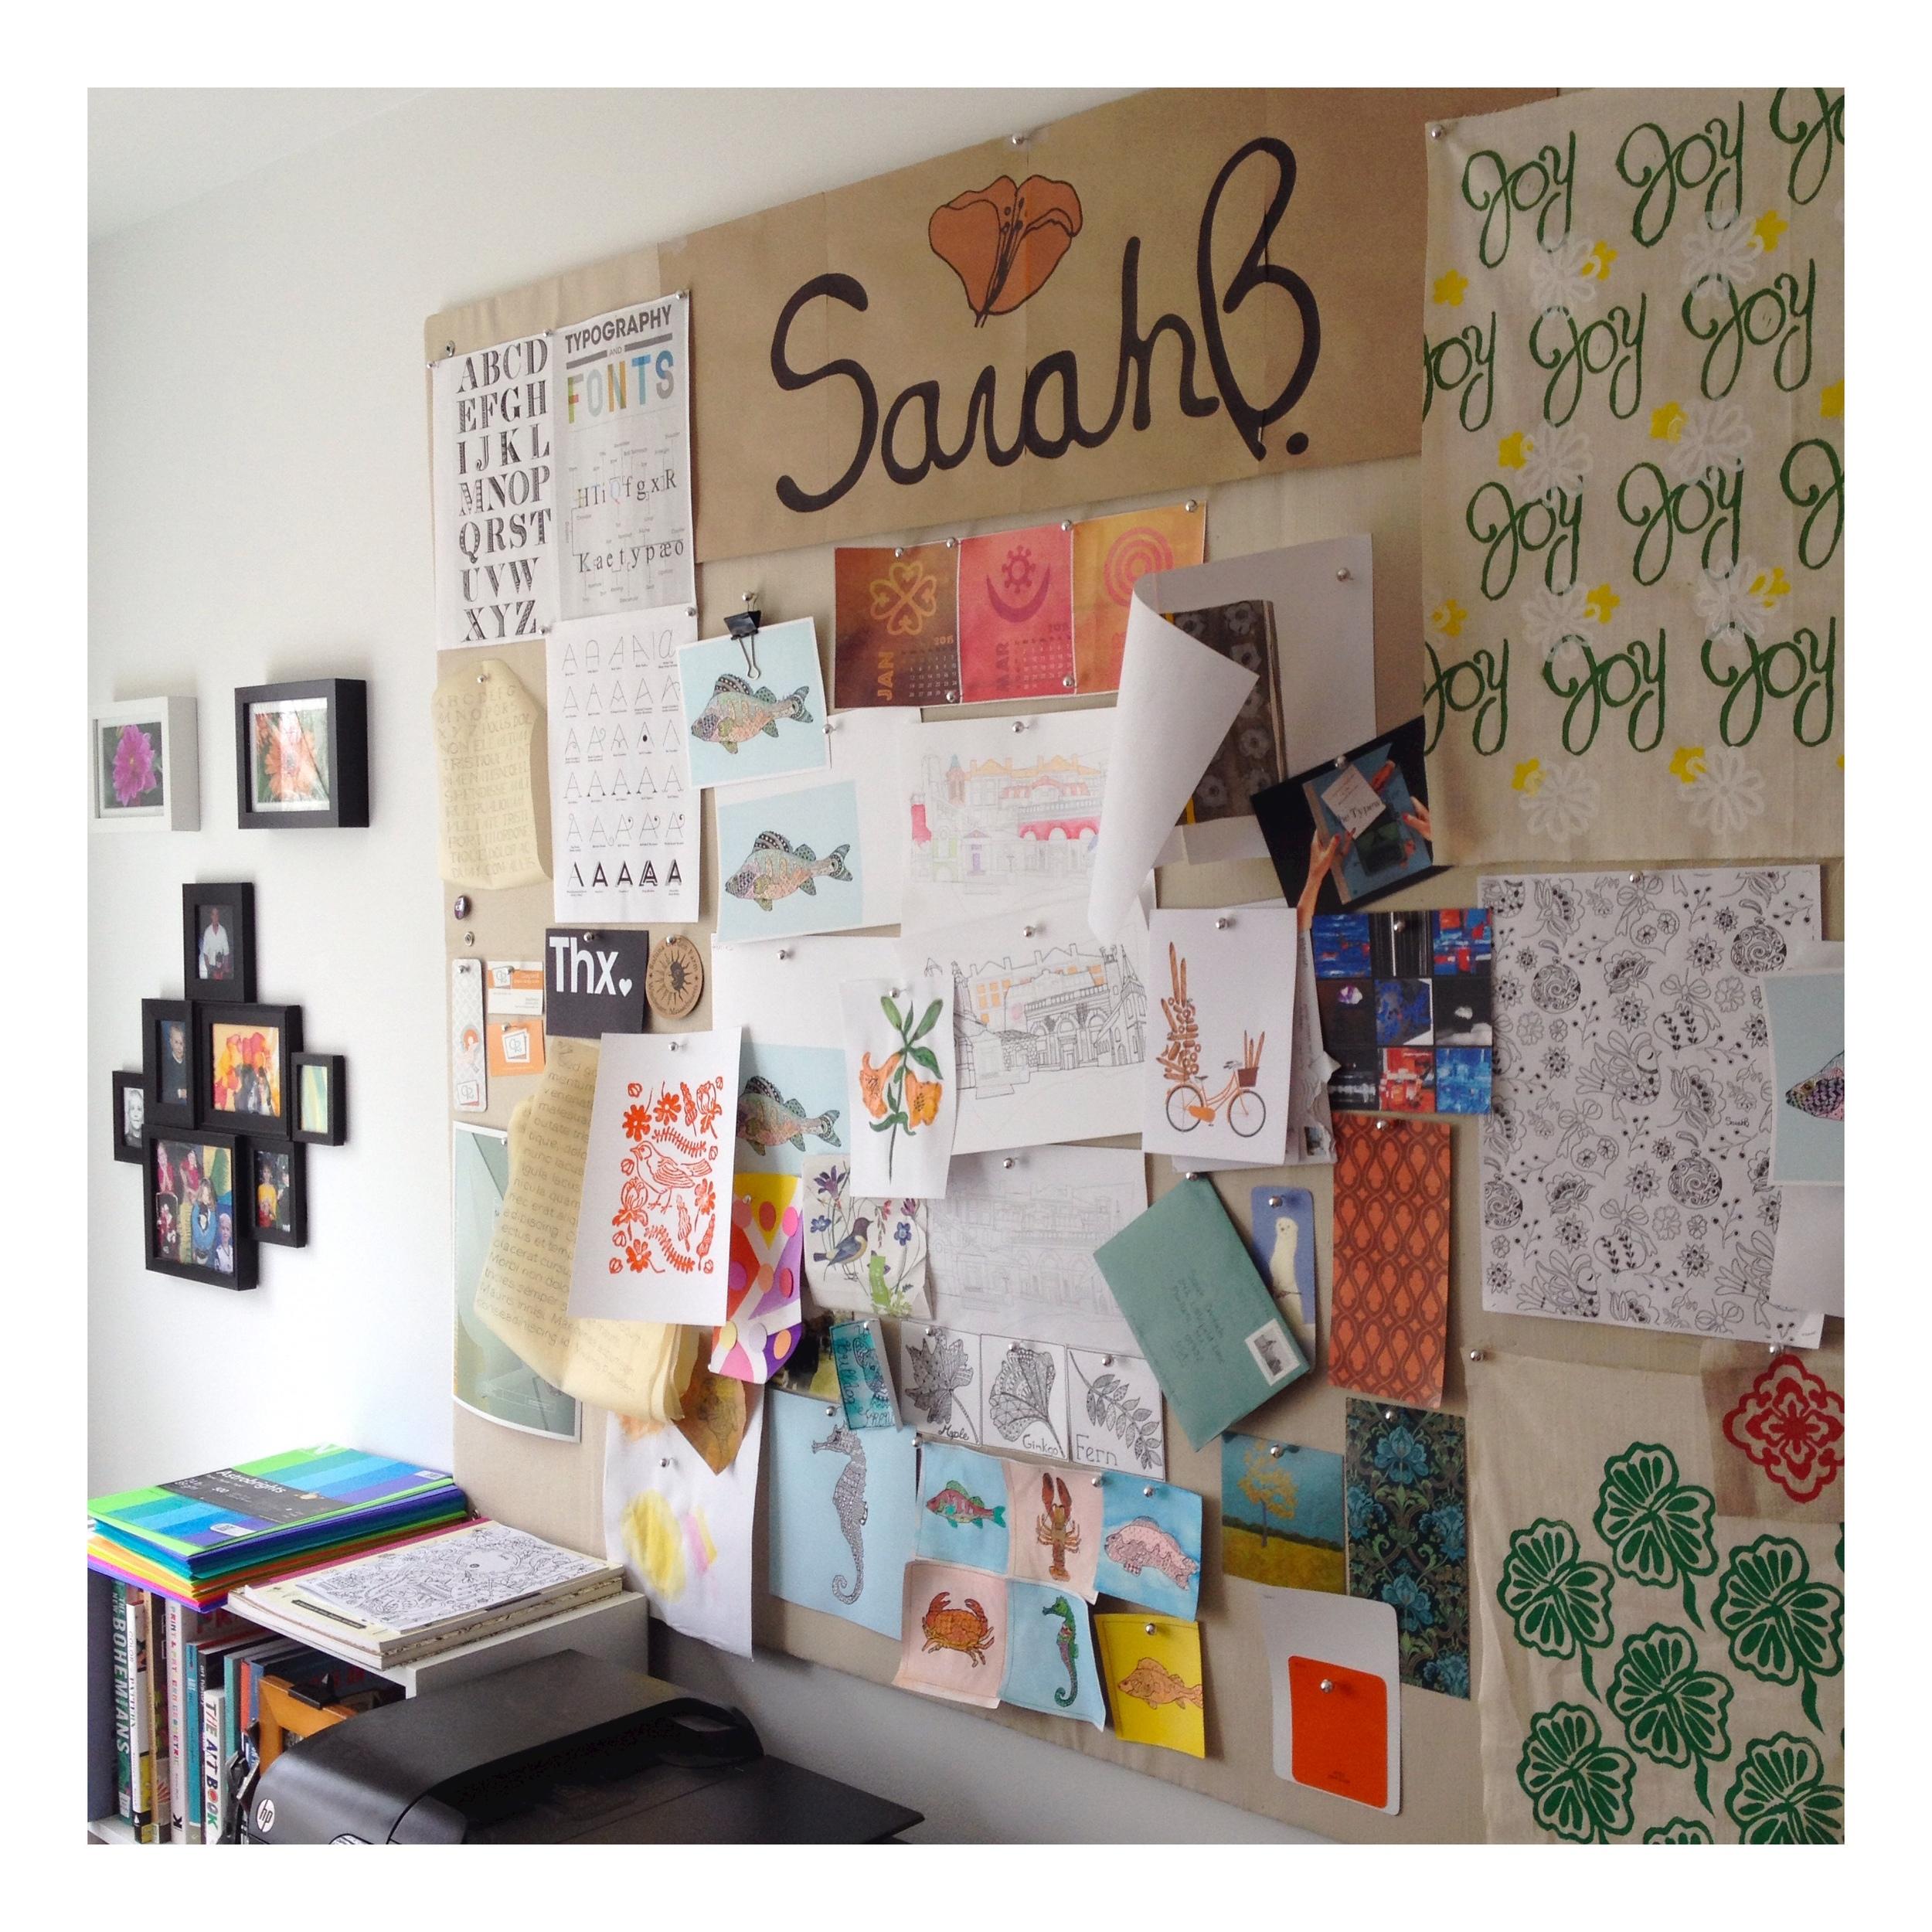 Mood board and inspiration wall